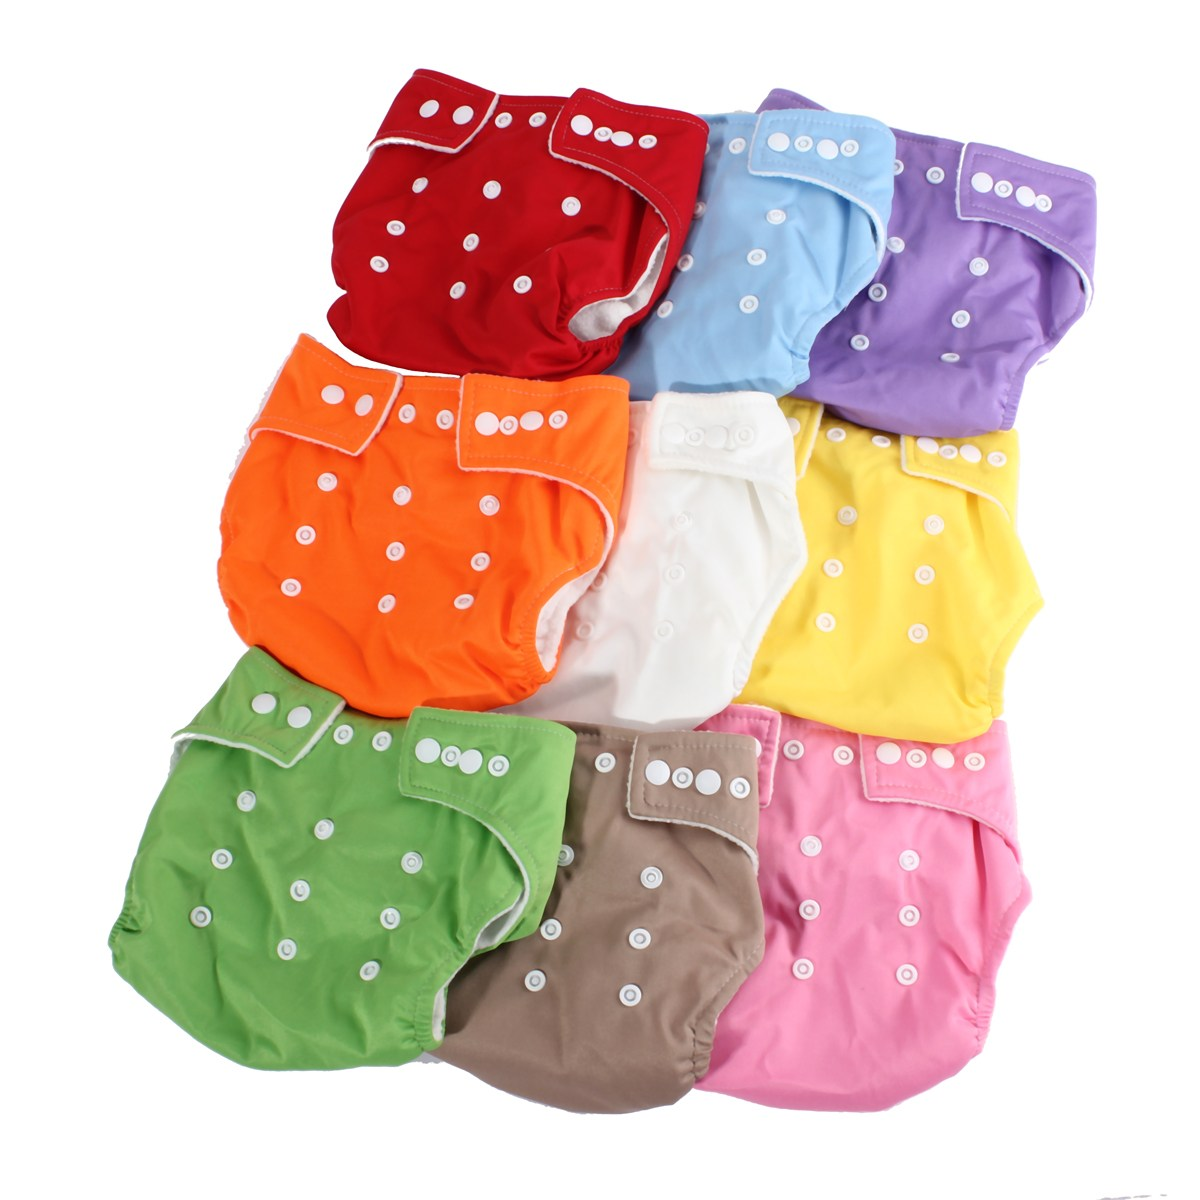 Cloth Diapers New Baby Reusable Washable Cotton Durable Gauze Soft Gentle Infant